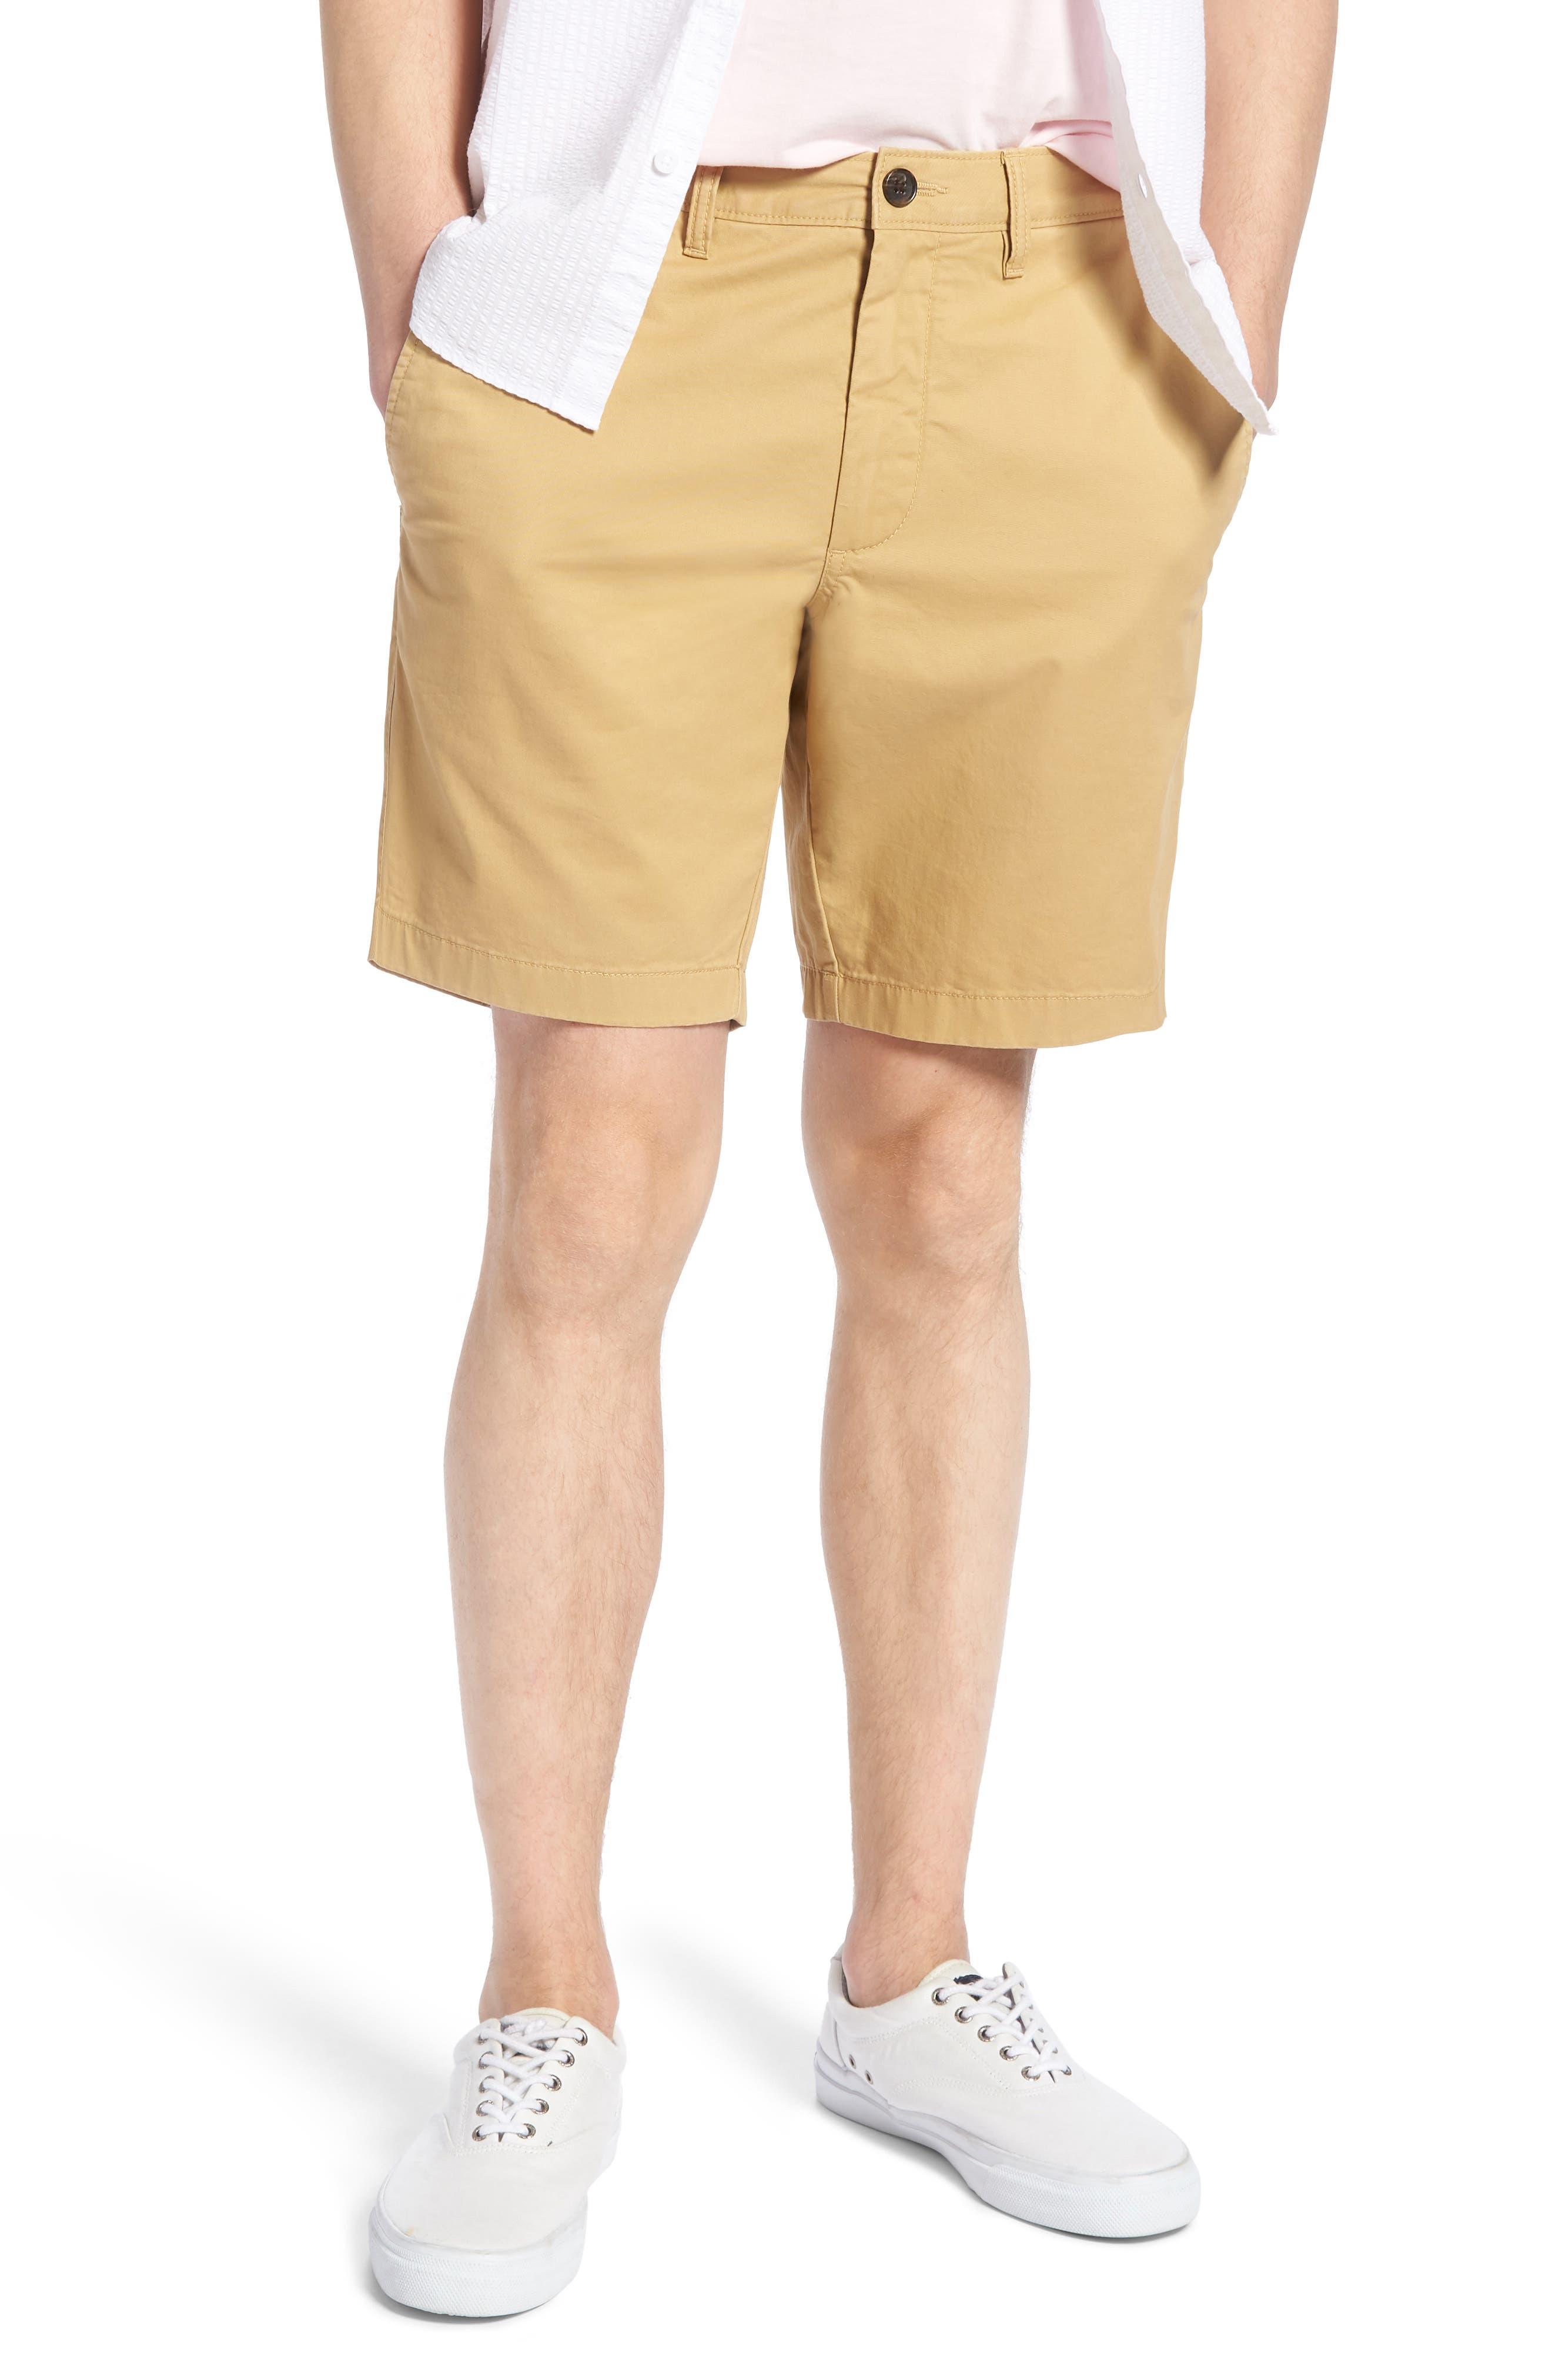 Ballard Slim Fit Stretch Chino 9-Inch Shorts,                             Main thumbnail 1, color,                             TAN LARK